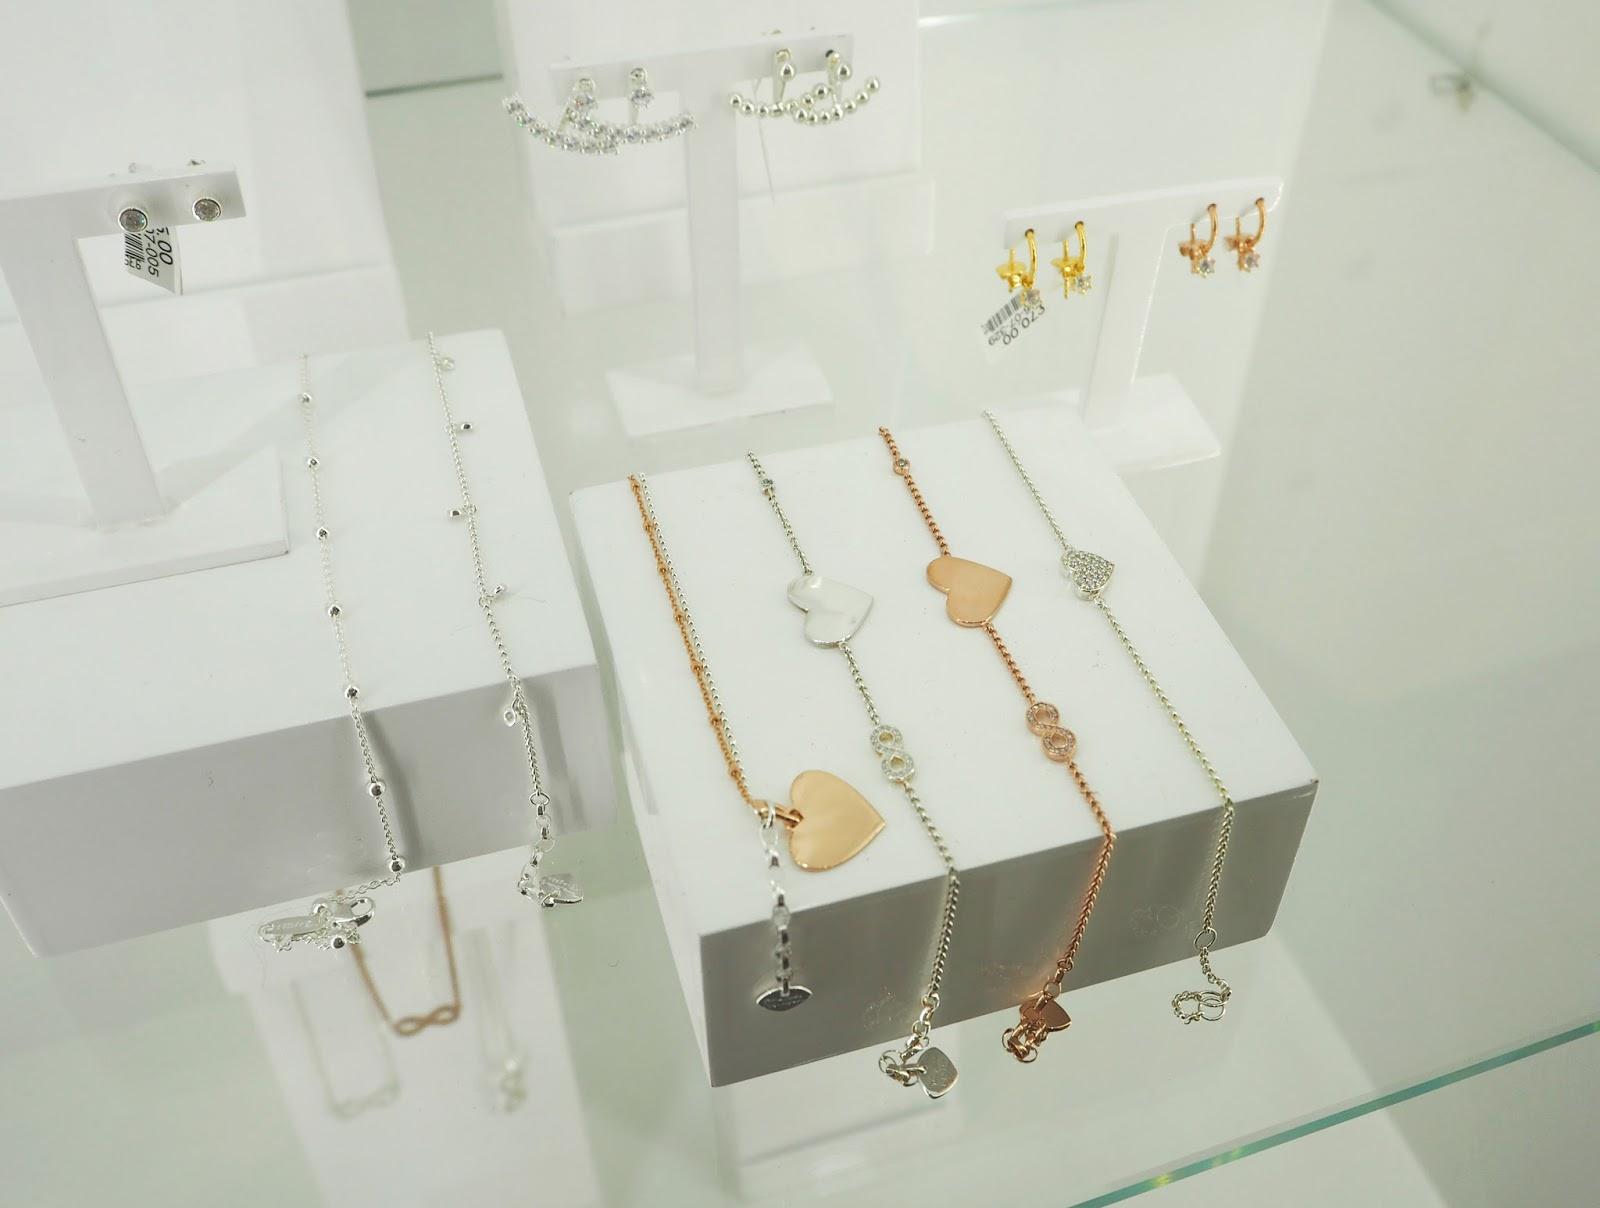 TH Baker X Thomas Sabo Engraved Jewellery, Katie Kirk Loves, #engraveyourlove, Blogger Event, Goodie Bag, Brighton, Thomas Sabo, Jewellery